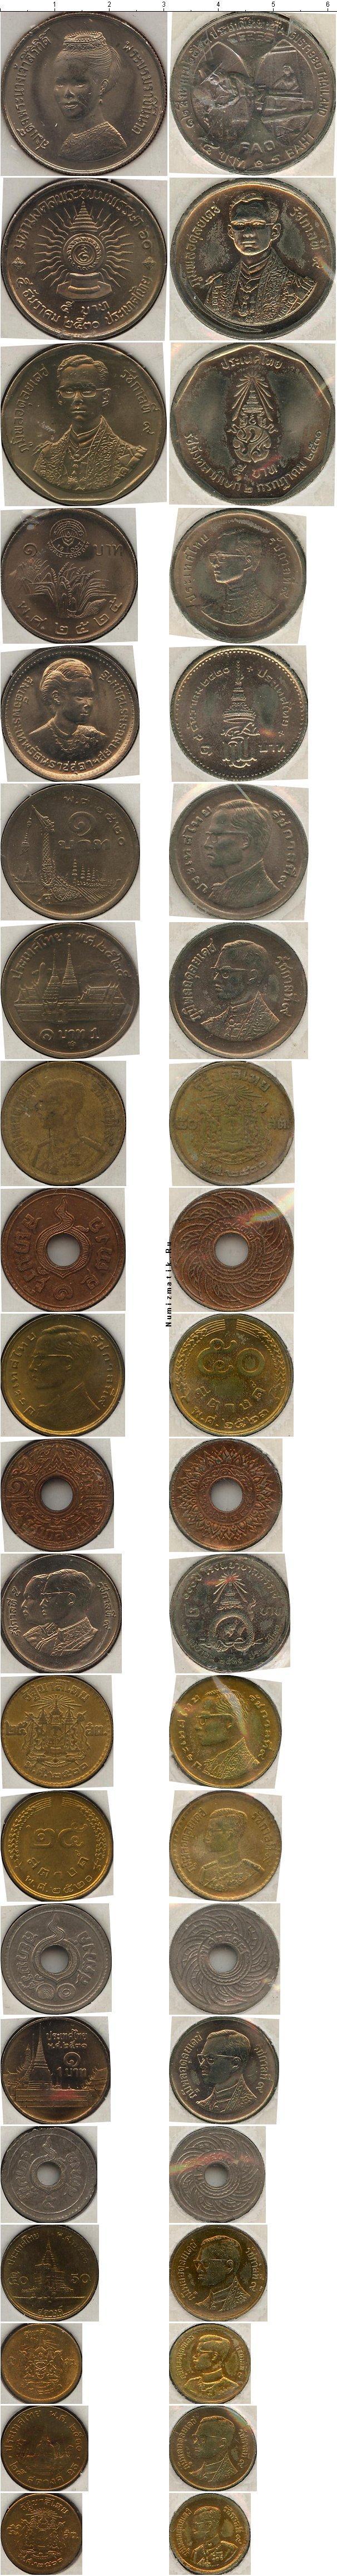 Каталог монет - Таиланд Монетная система Таиланда